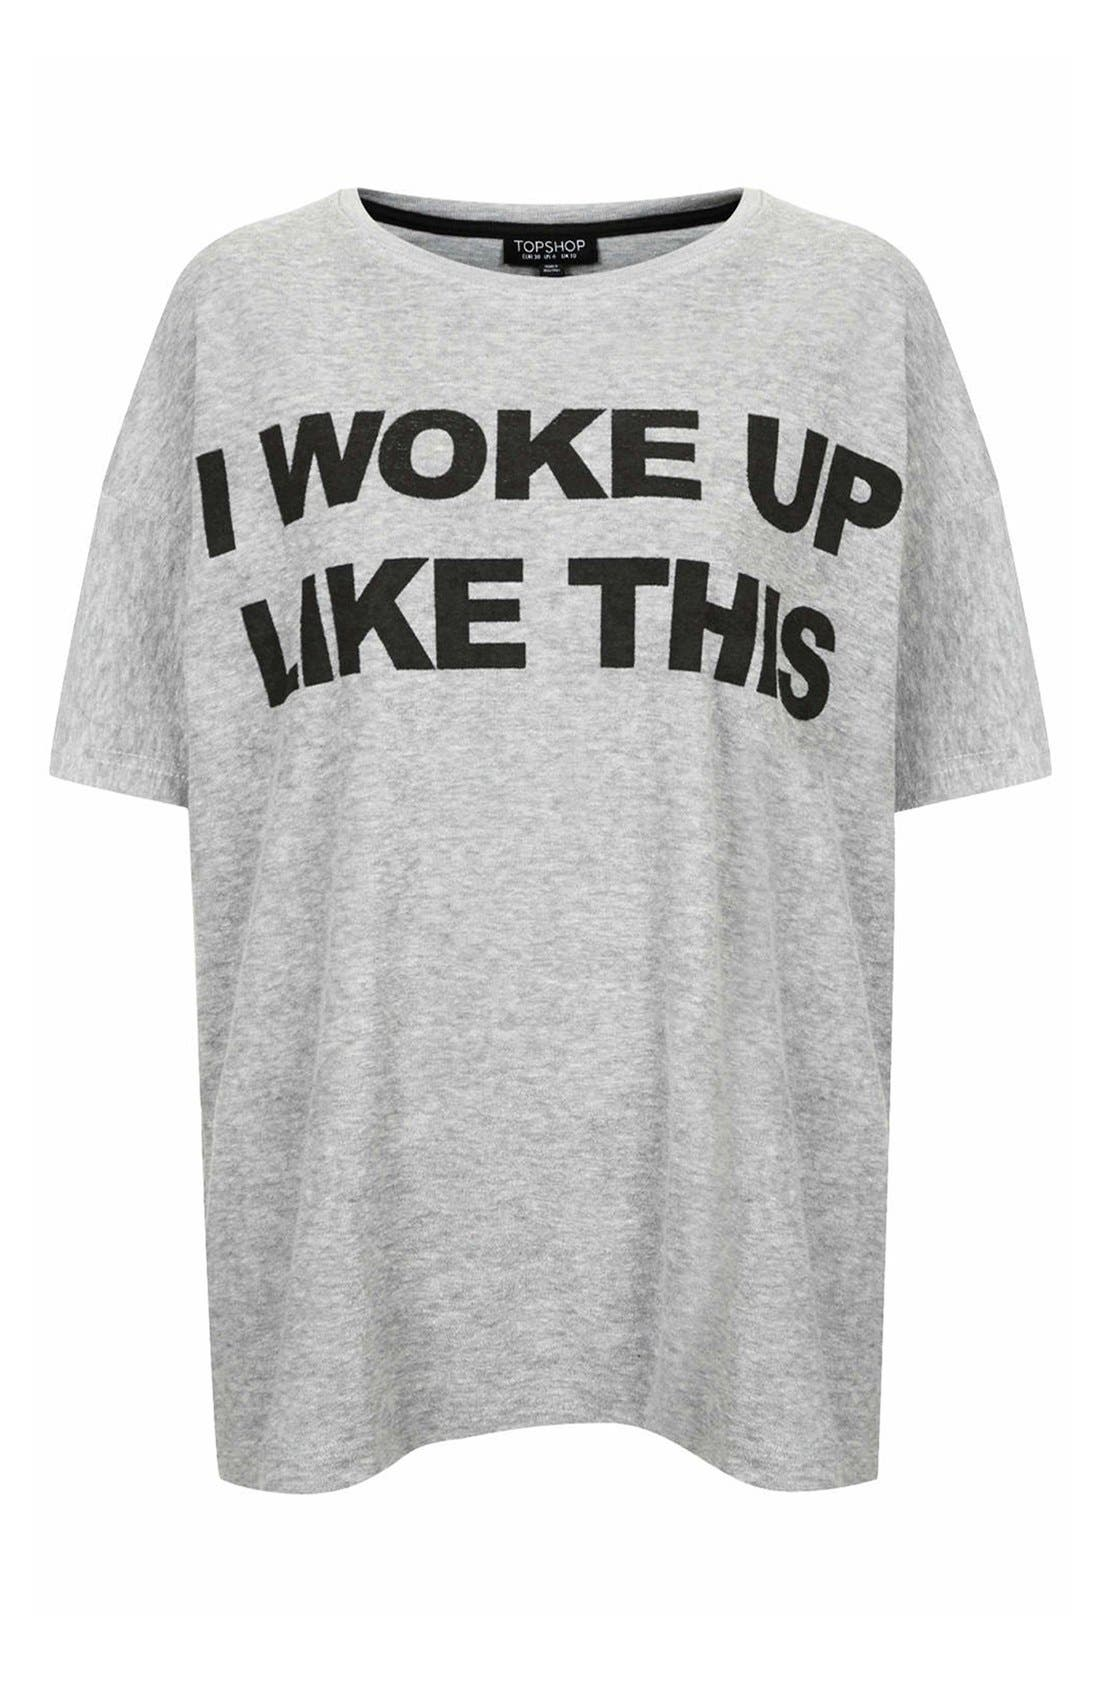 Alternate Image 3  - Topshop 'I Woke Up Like This' Tee